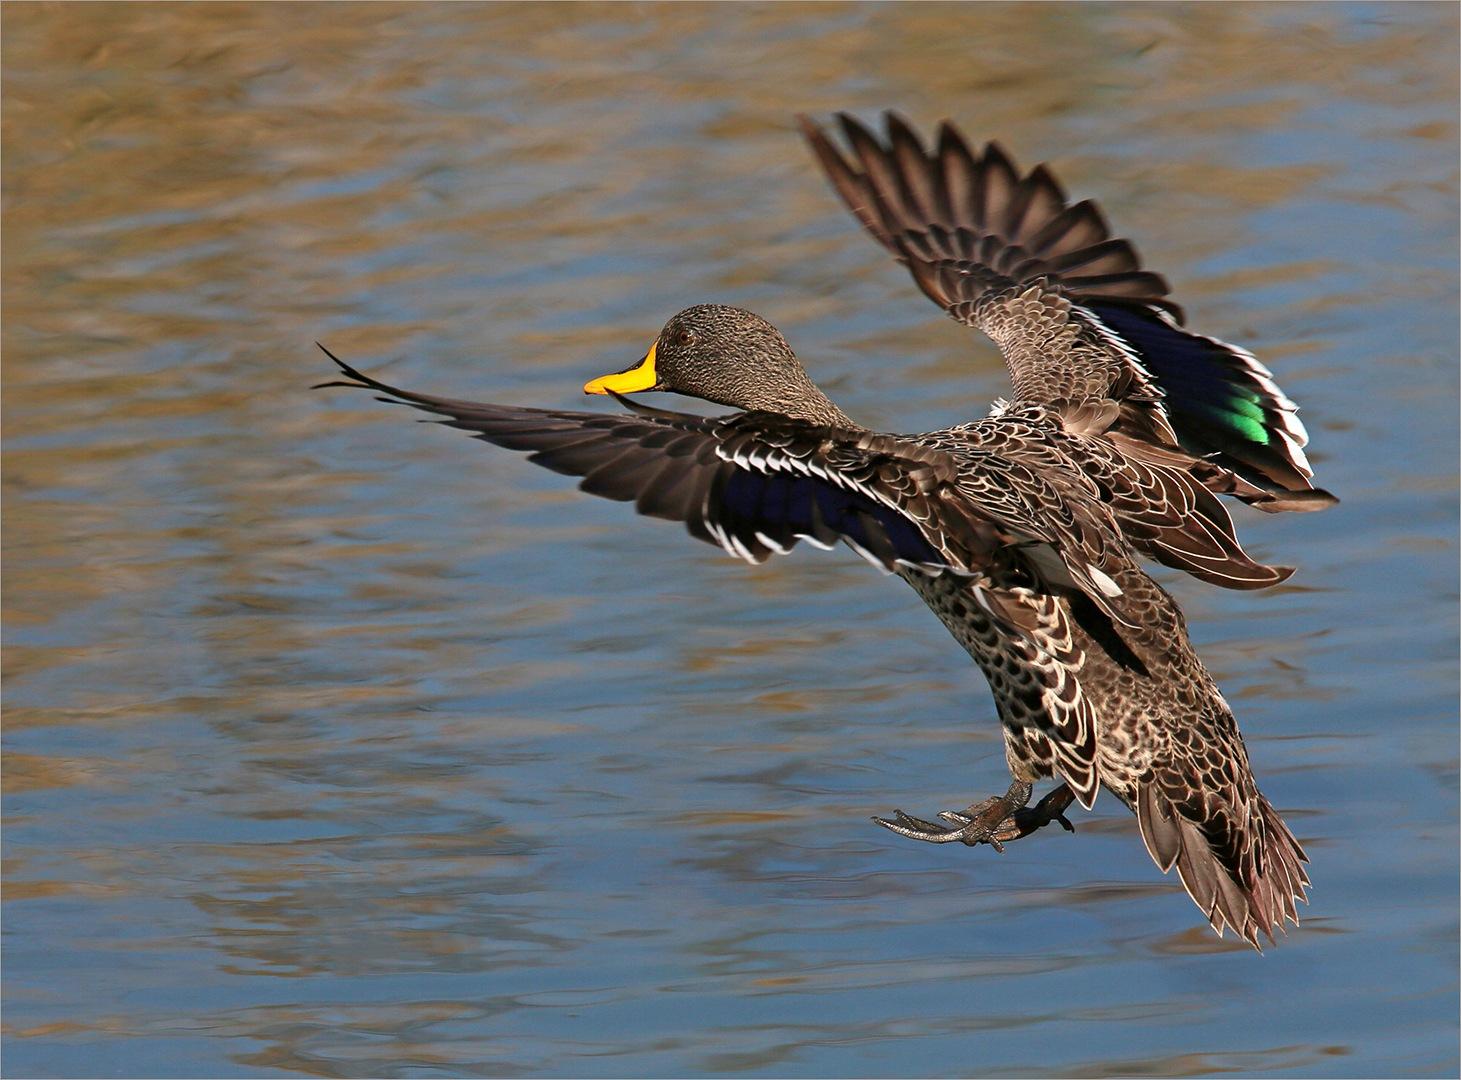 Yellow-billed duck landing approach by Johann Harmse